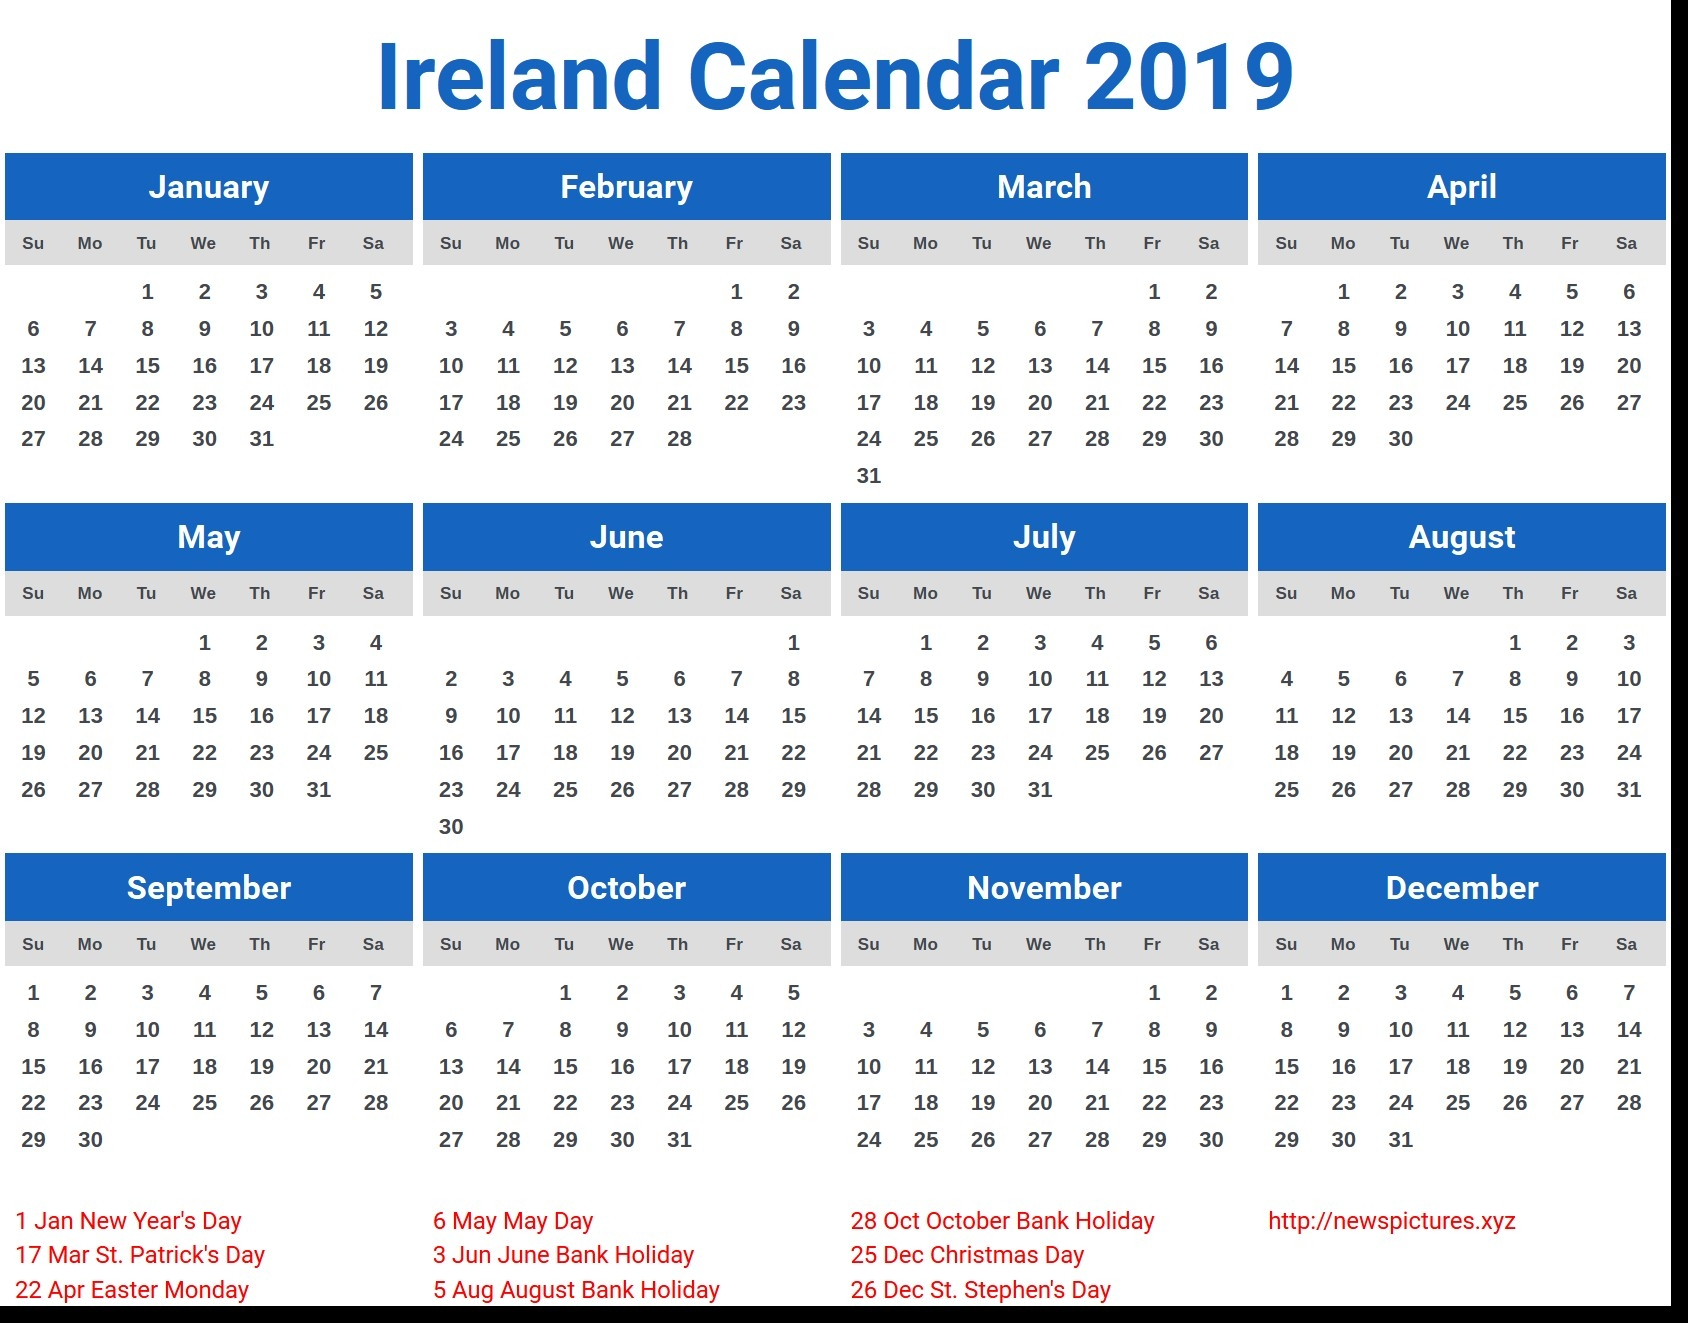 Calendar 2019 Malaysia With Holidays Calendar 2019 Ireland Free Calendar 2019 Ireland